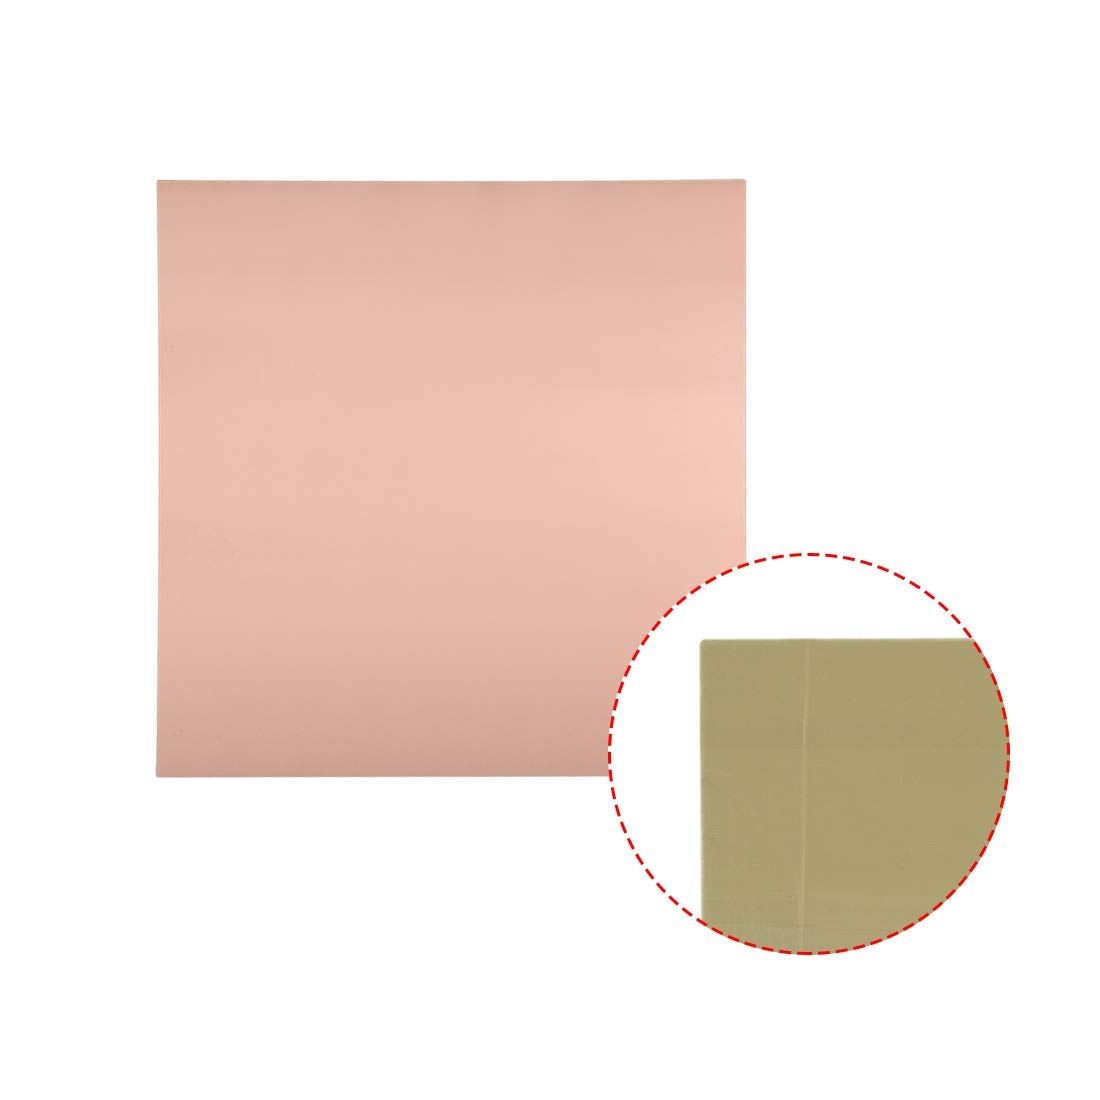 5 unidades, 180 x 120 mm, revestimiento de cobre de doble cara, FR4, 1,5 mm de grosor Sourcingmap Placa de circuito laminado PCB